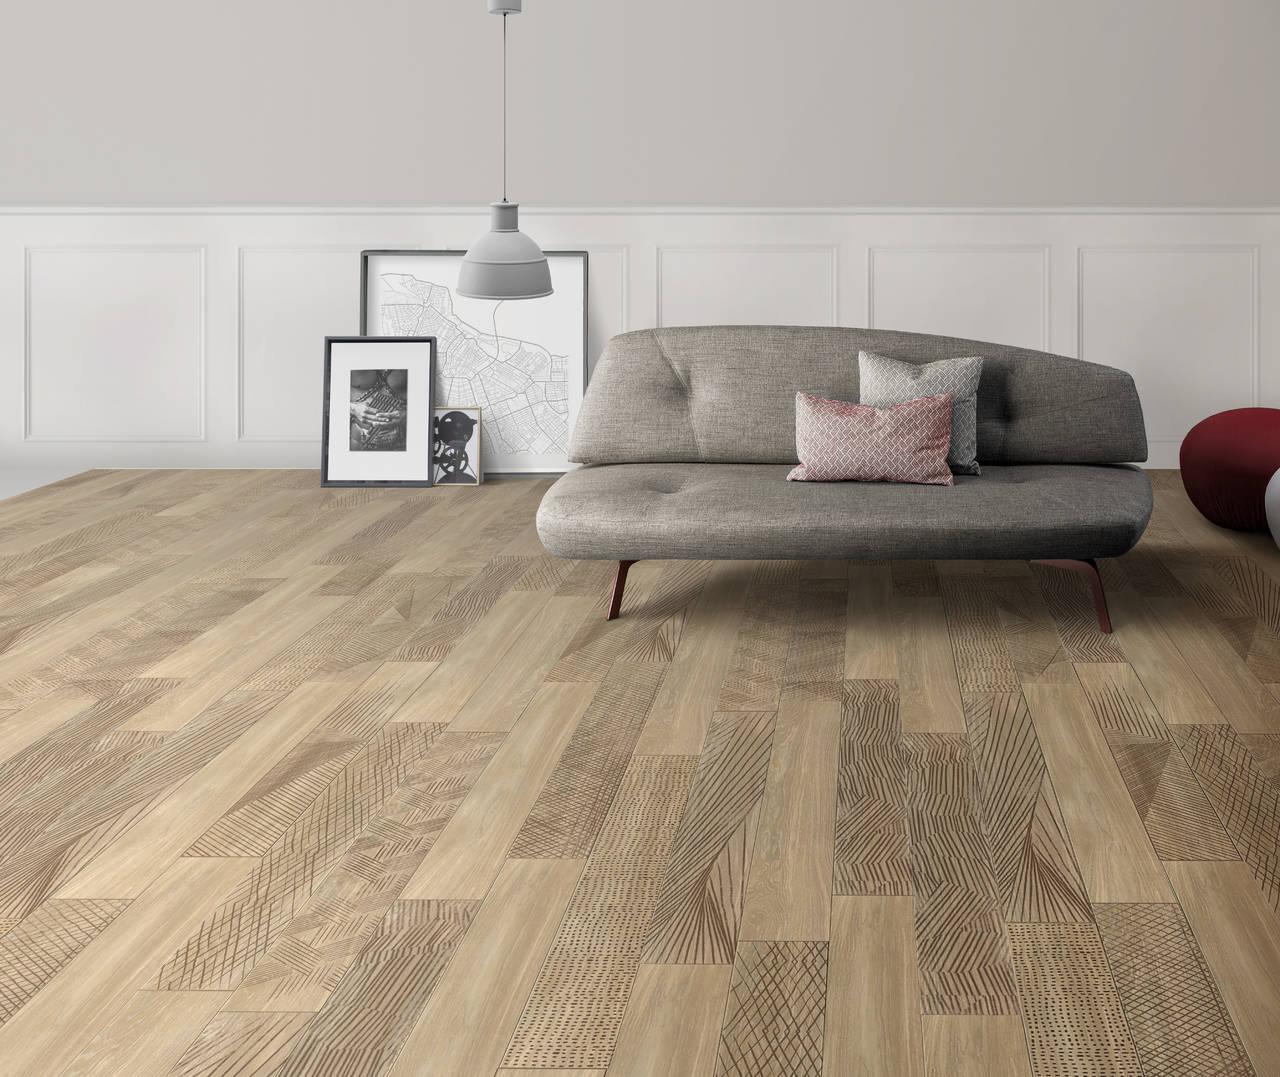 Listone Giordano Inkiostro Bianco Frontier Flooring Undici Laser Engraved Flooring Vancouver